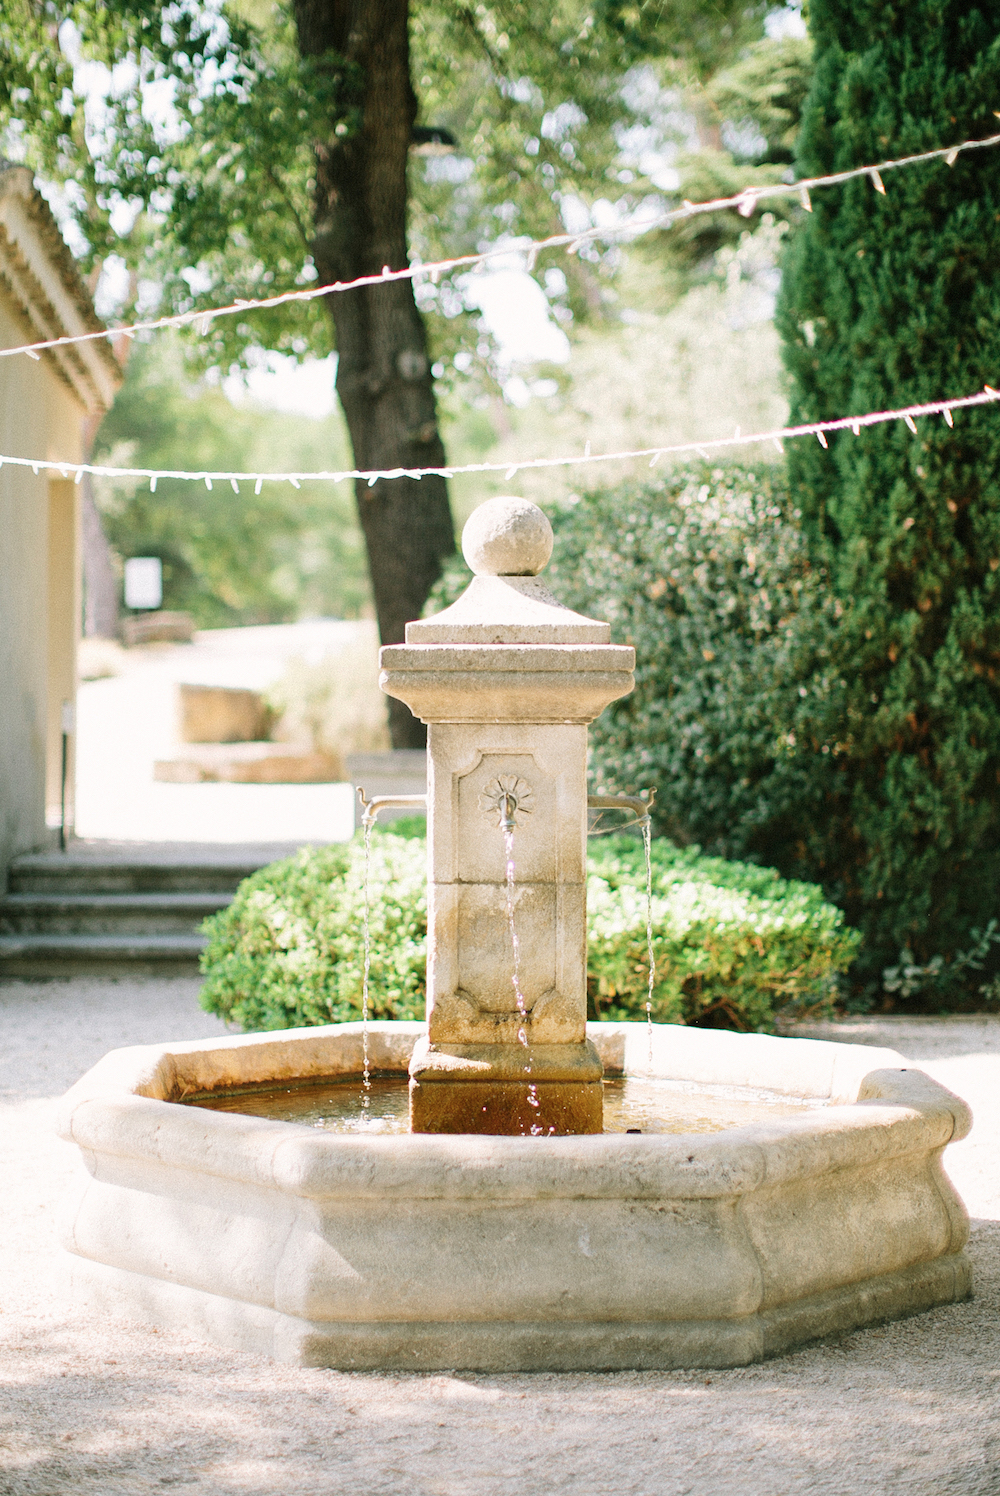 ©-saya-photography-studio-ohlala-wedding-photographer-photographe-mariage-chateau-de-la-tour-vaucros-avignon-50.jpg